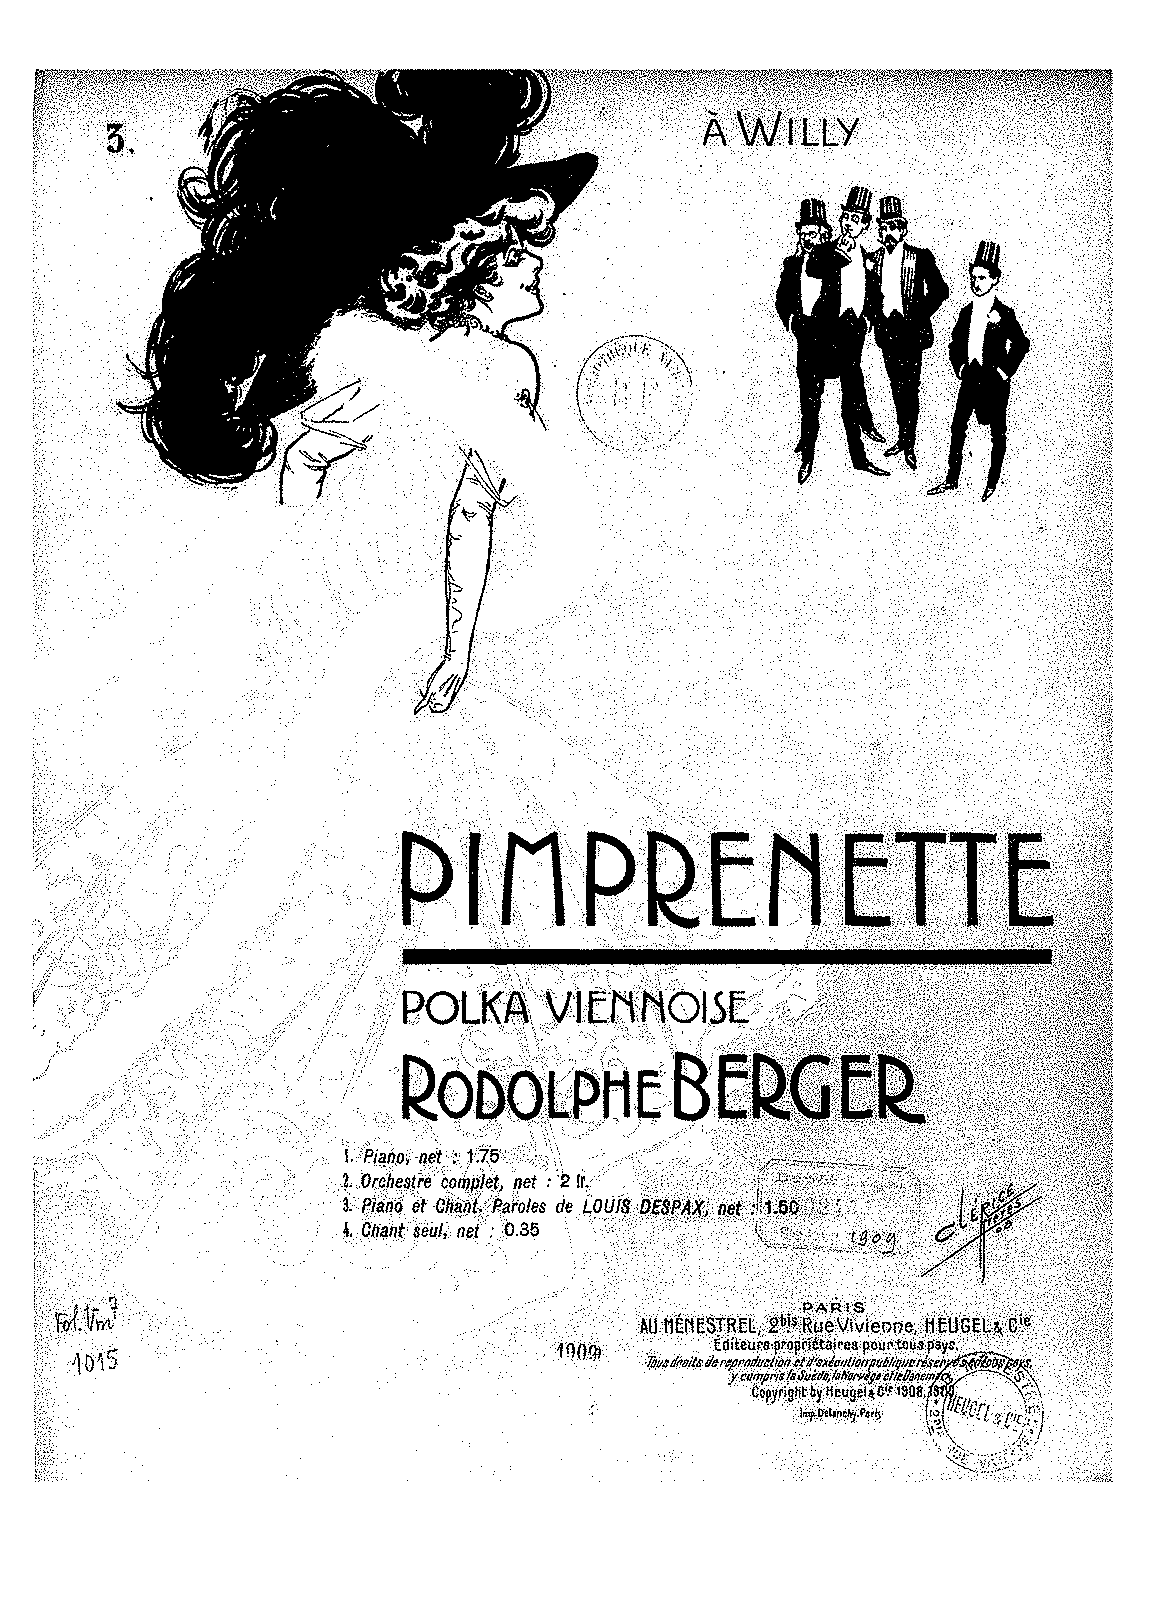 Pimprenette (Berger, Rodolphe) - IMSLP/Petrucci Music Library: Free